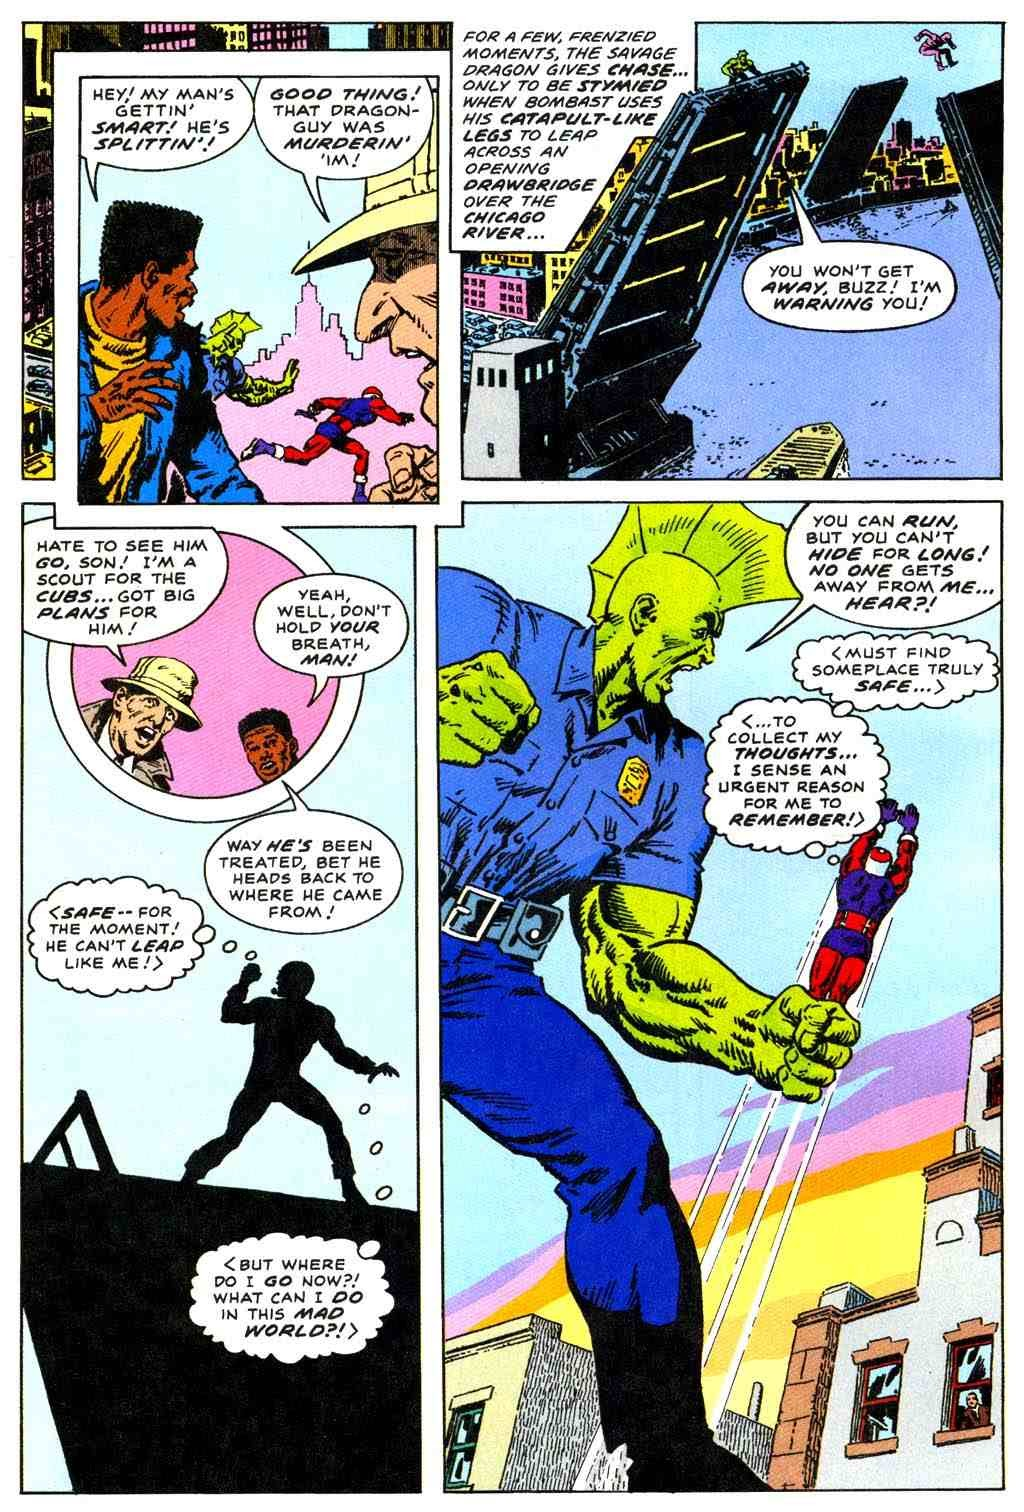 Read online Bombast comic -  Issue # Full - 18